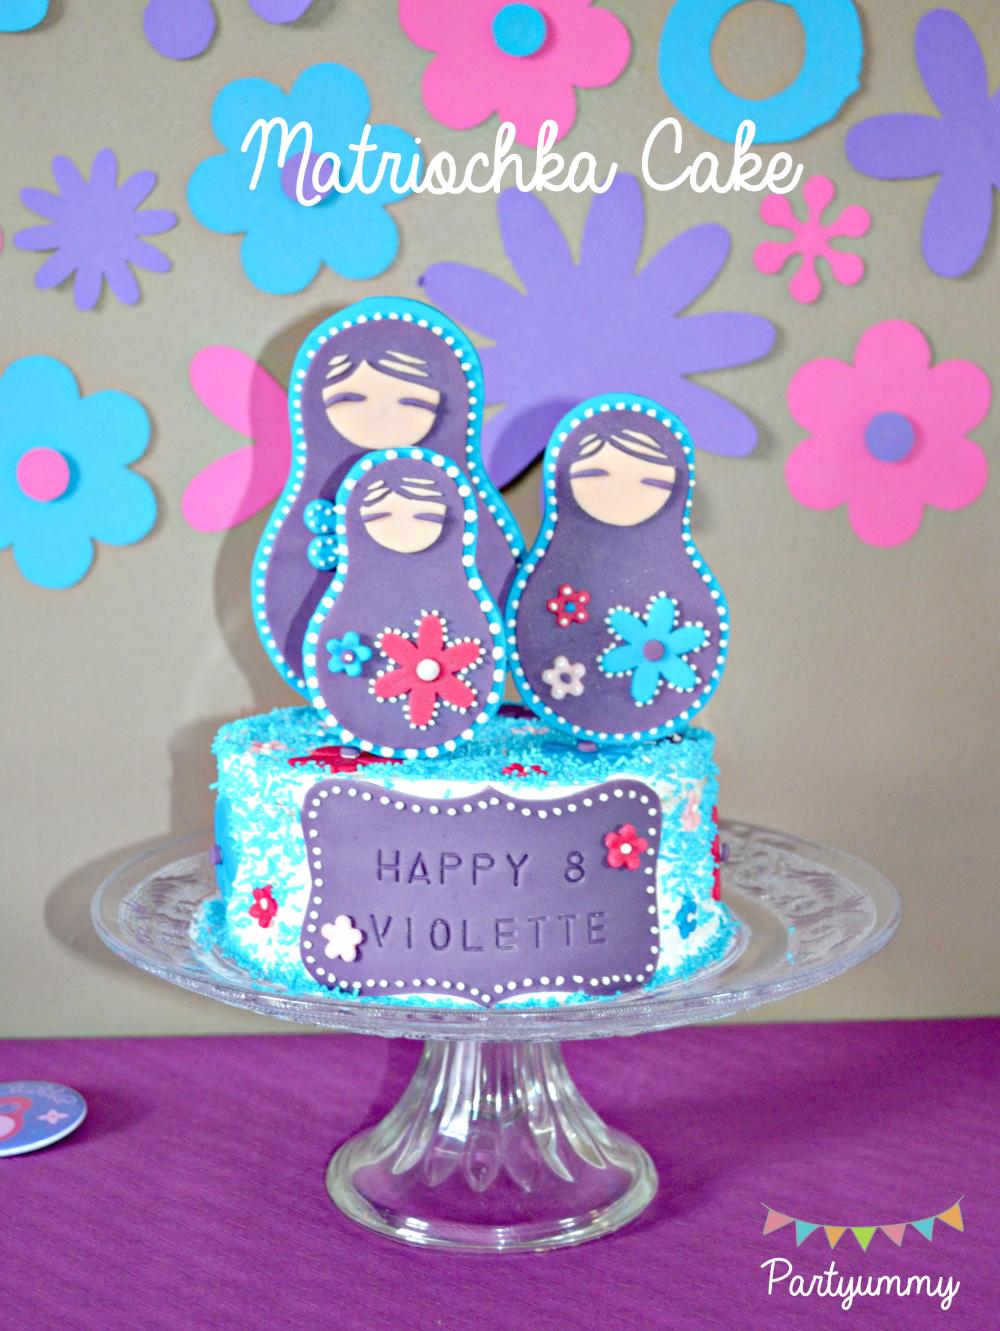 gateau-poupee-russe-matriochka-cake-russian-doll